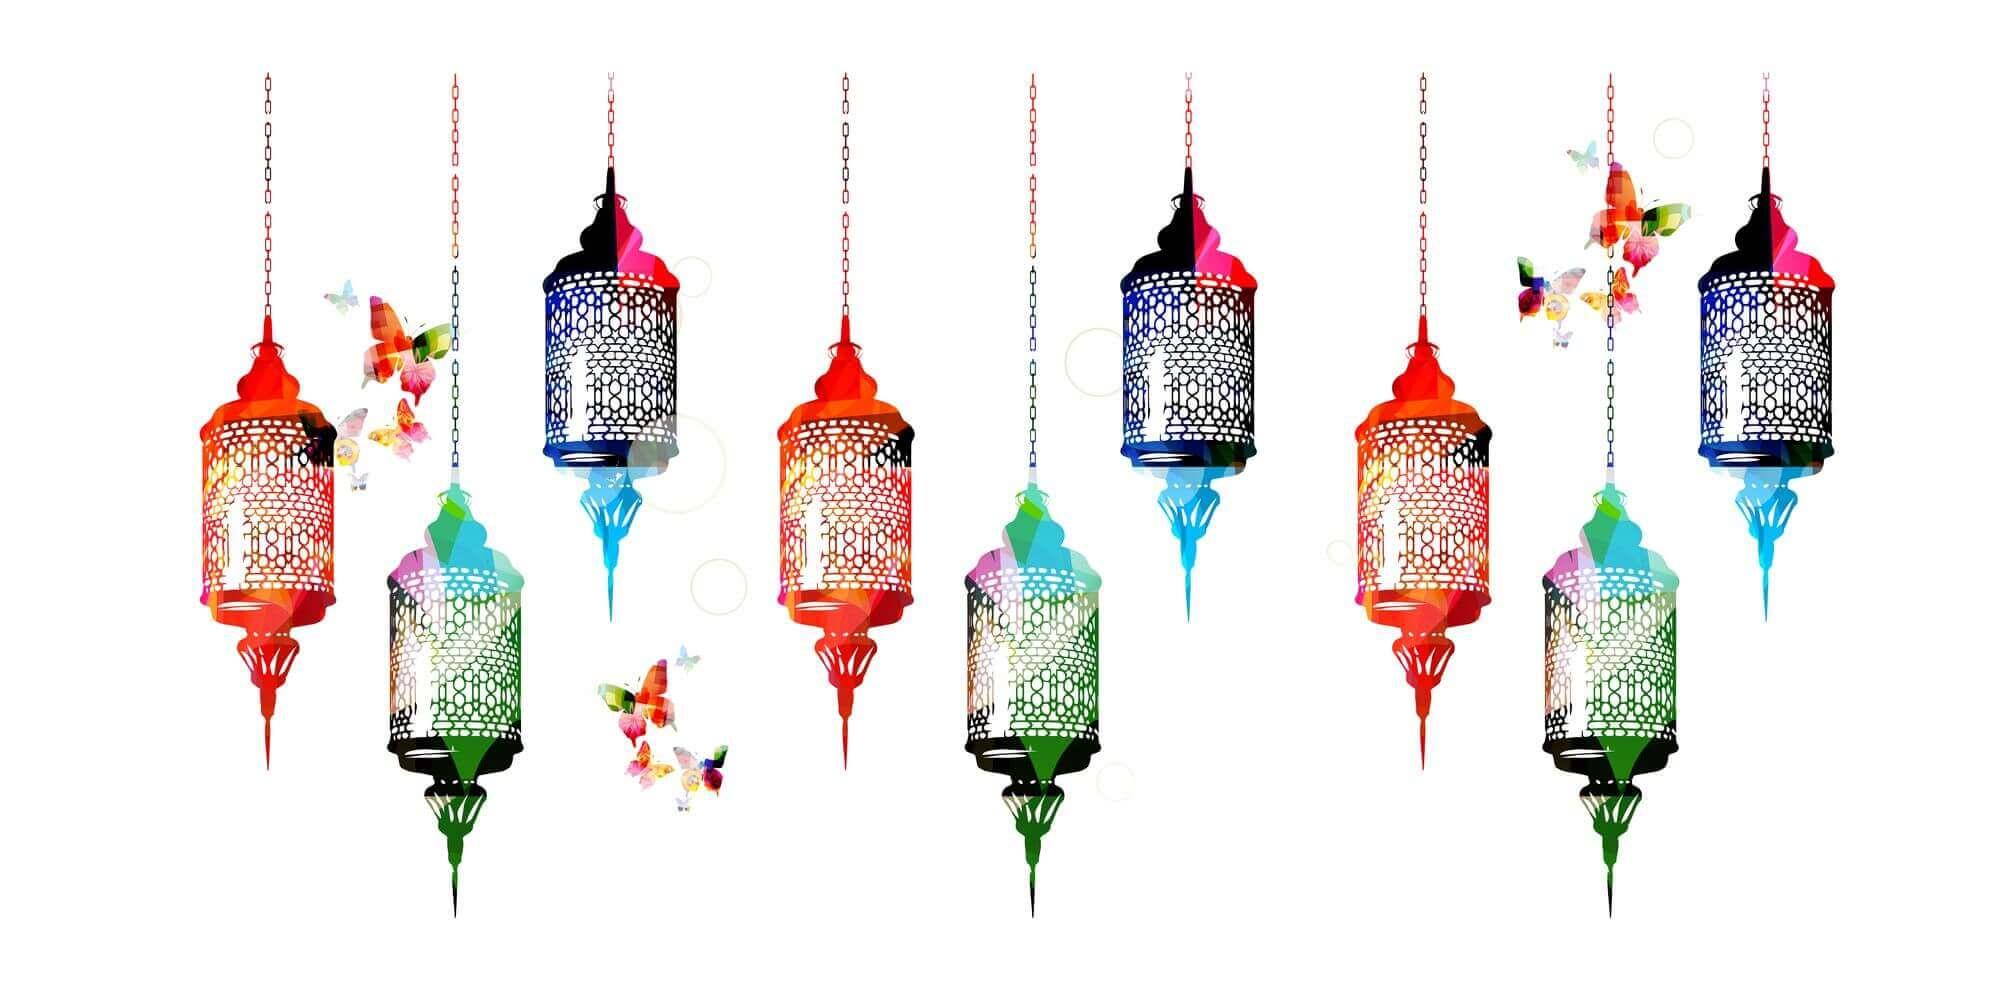 Jasa Pembuatan Kaligrafi Arab Online Kaligrafi Art Islam